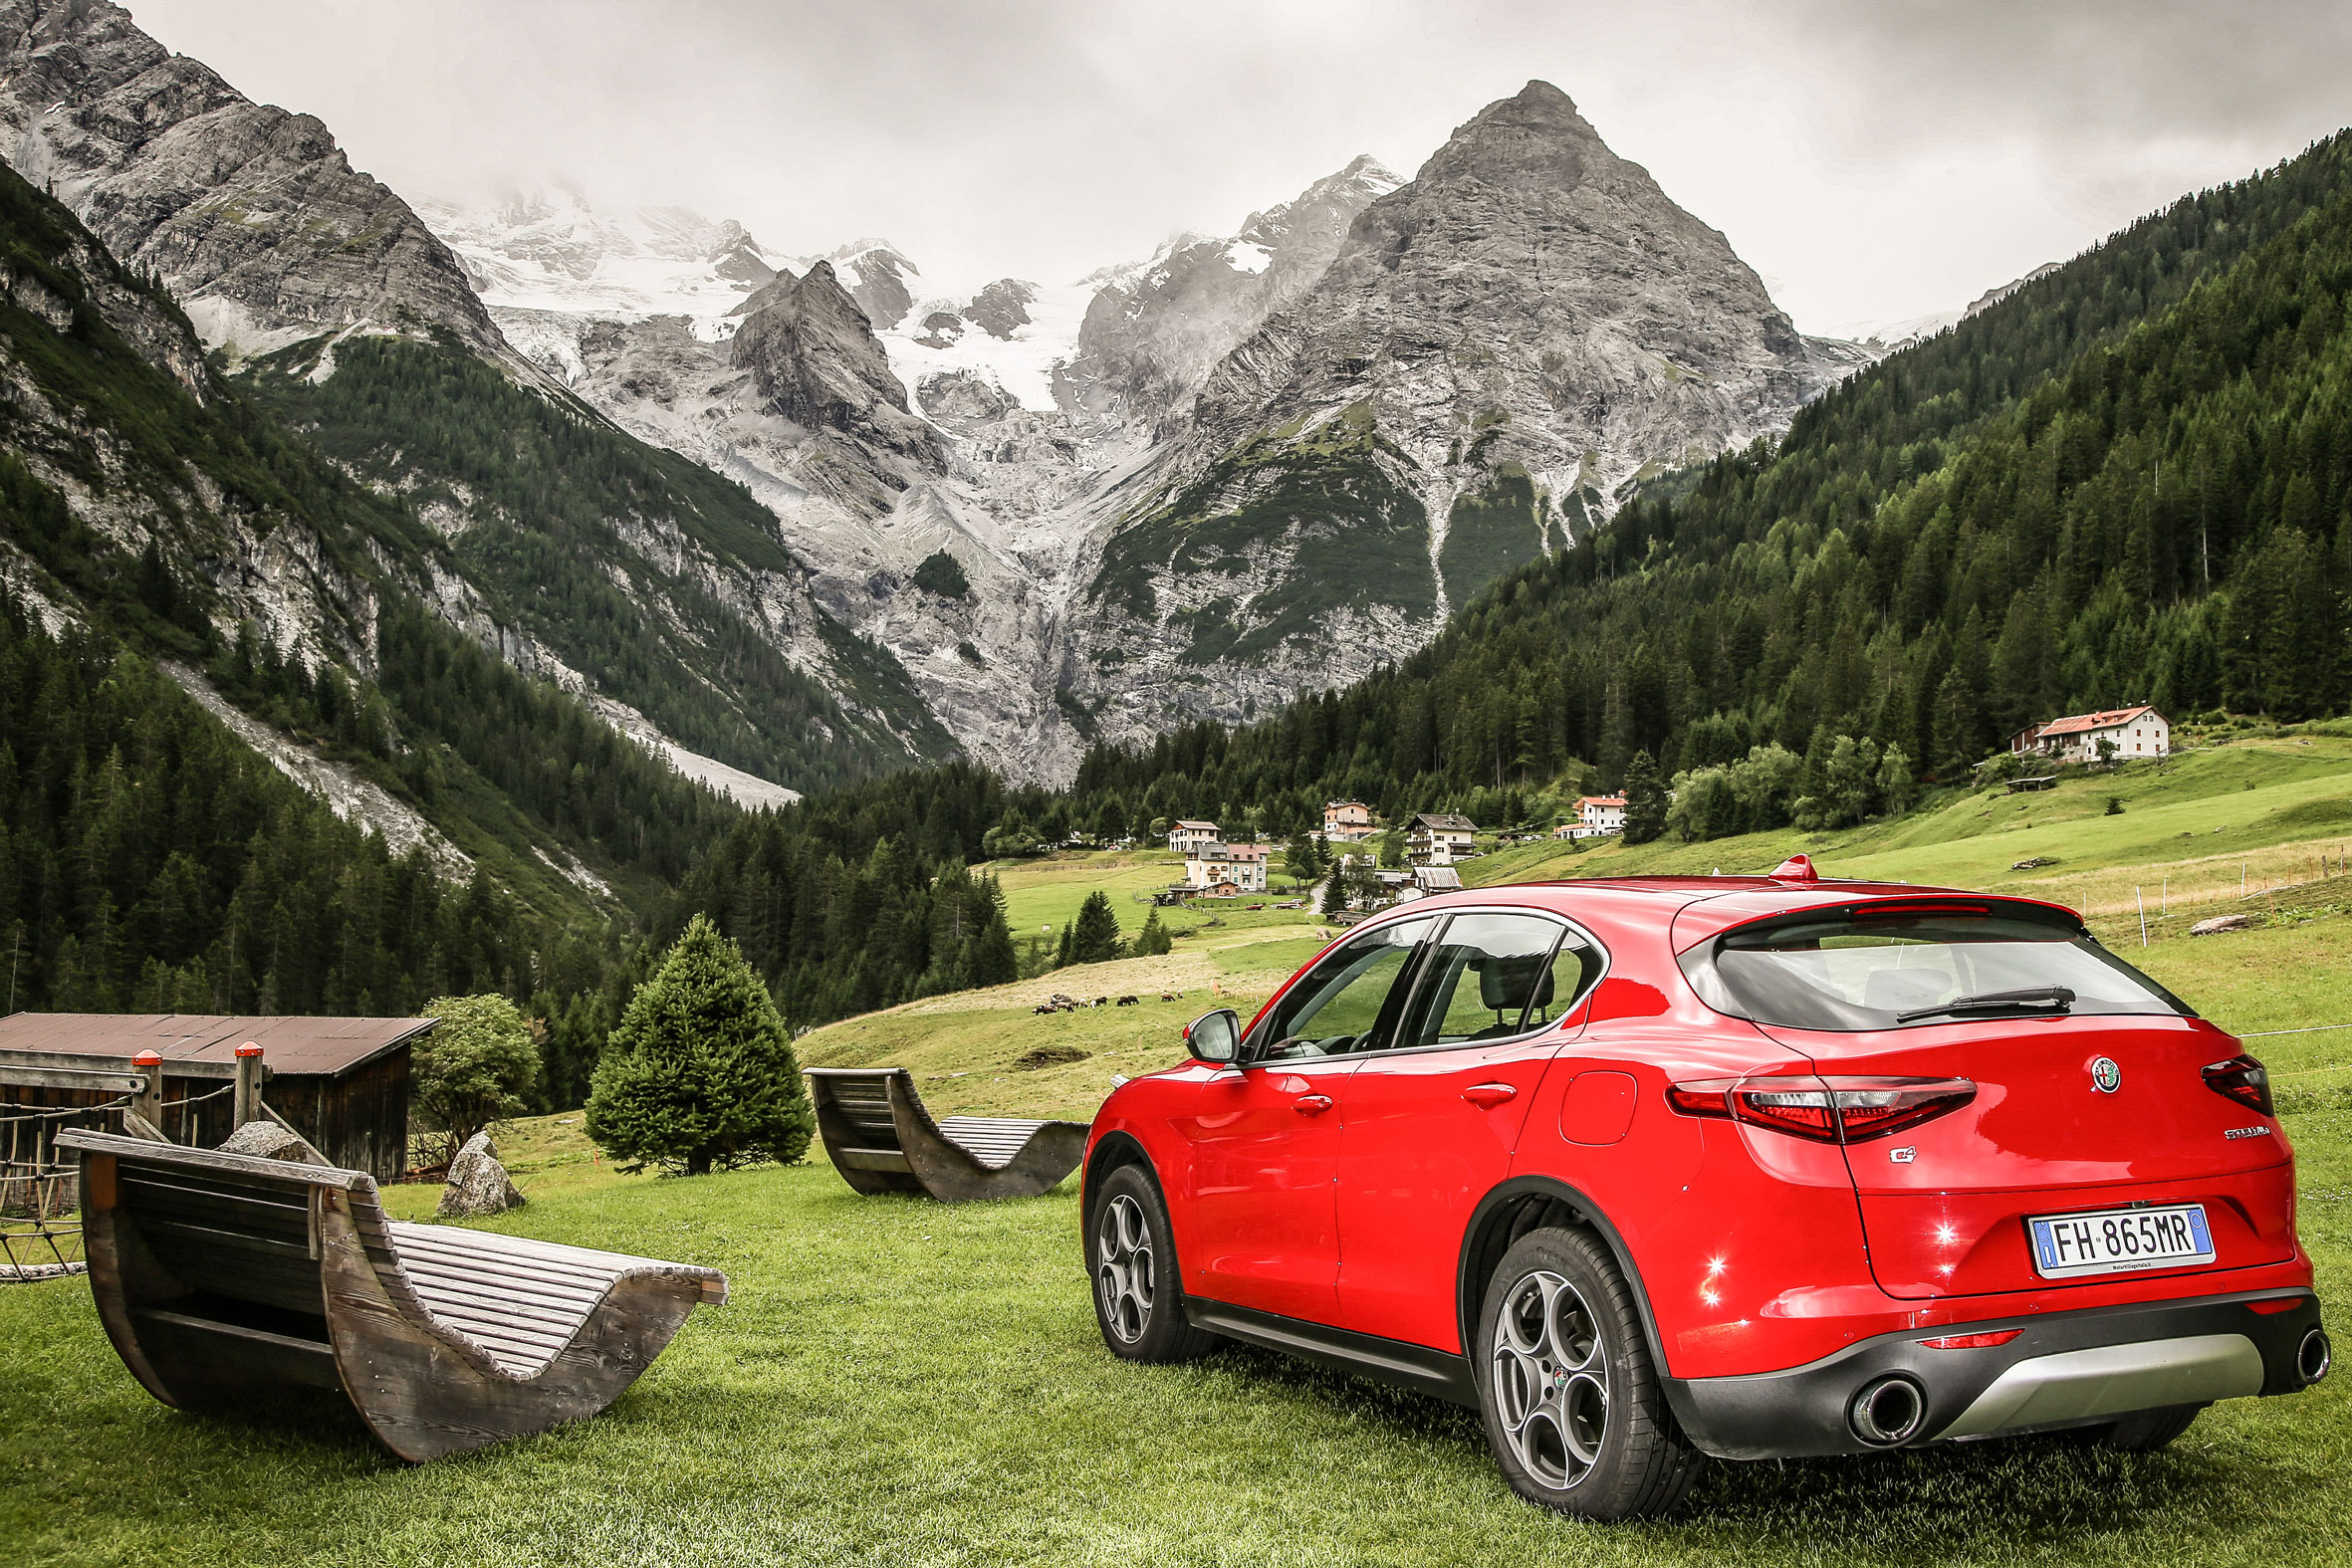 Alfa Romeo Stelvio Review - Prices, Specs And 0-60 Time